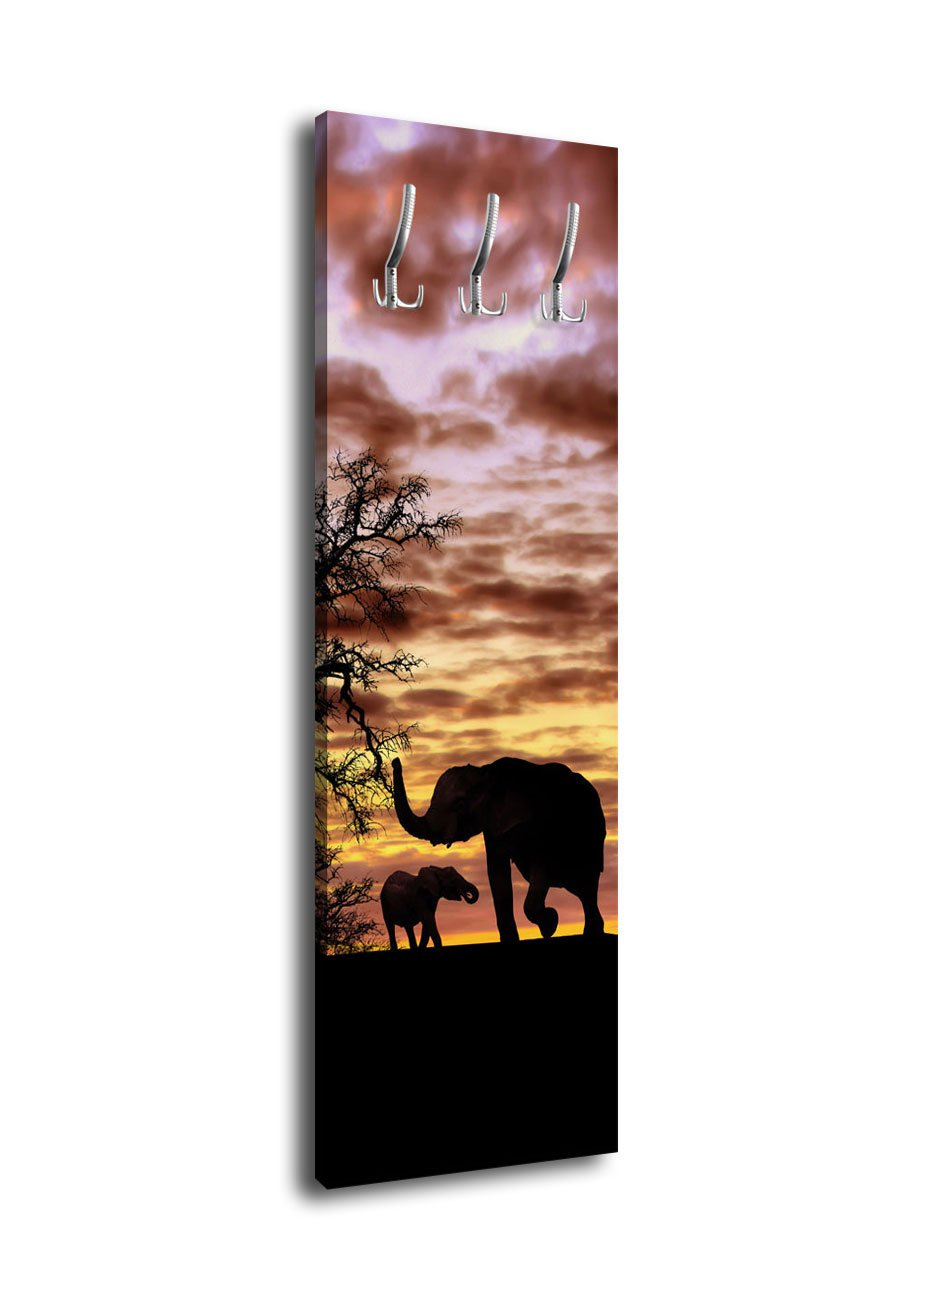 Wandmotiv24 Garderobe mit Design Savanna Heart G435 40x125cm Wandgarderobe Afrika Steppe Elefant